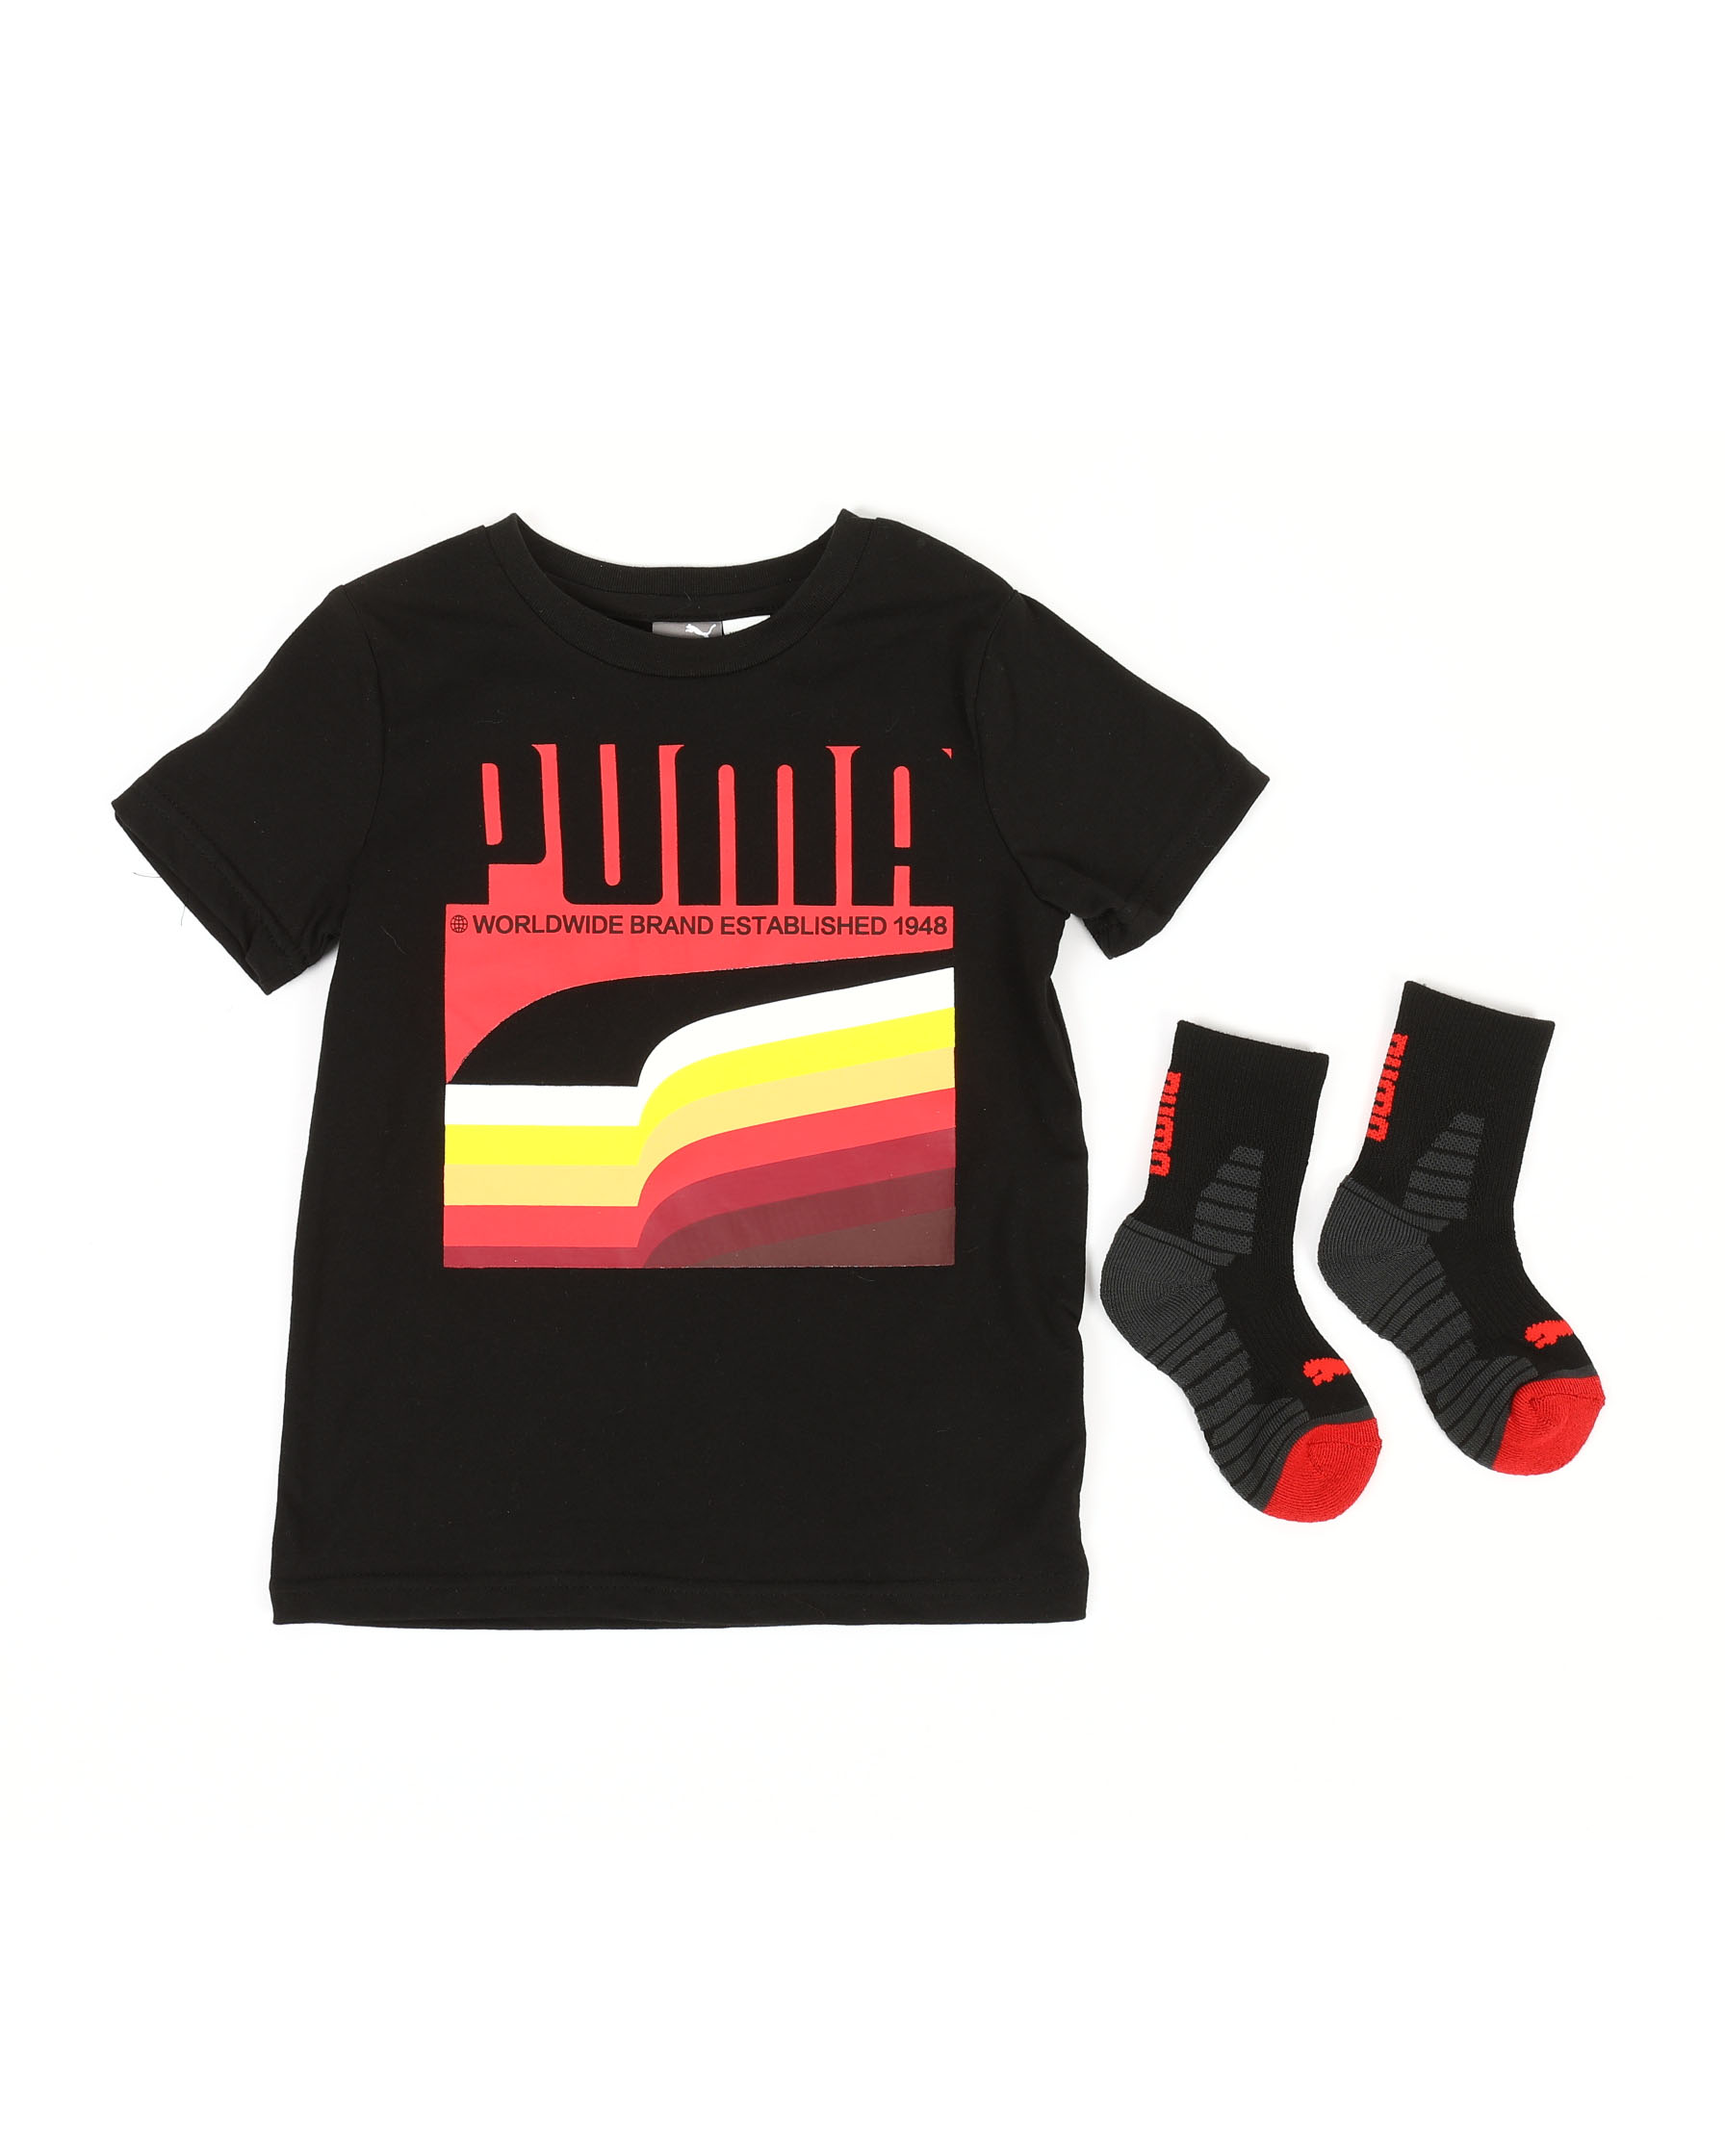 faf25a7325aa Buy Graphic Tee & Sock Set (4-7) Boys Tops from Puma. Find Puma ...